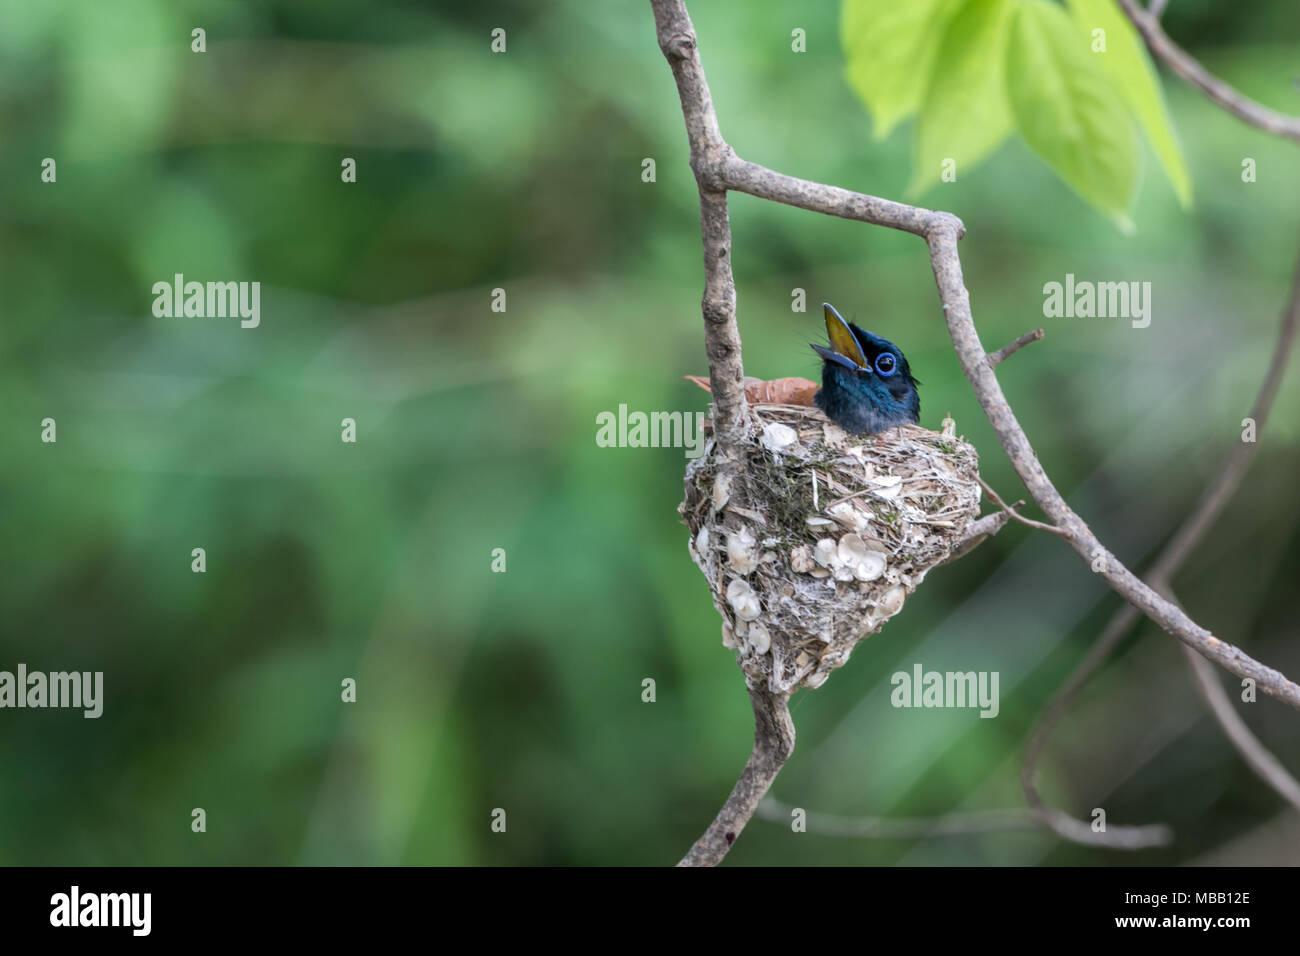 The Indian paradise flycatcher (Terpsiphone paradisi) inside Tadoba Andhari Tiger Reserve in Maharashtra, India Stock Photo